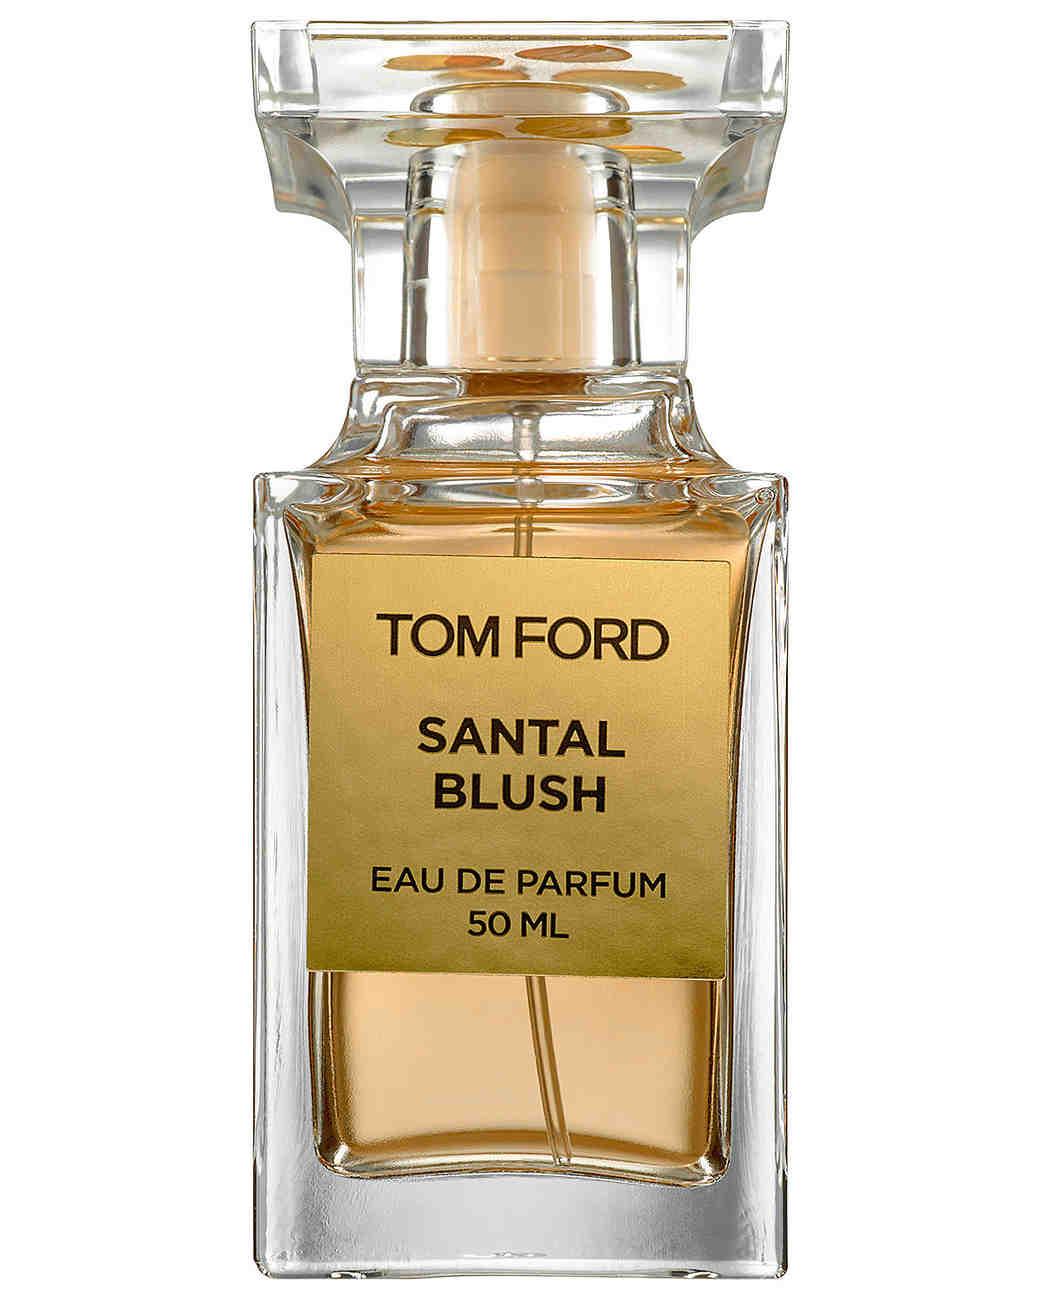 tom ford winter fragrance